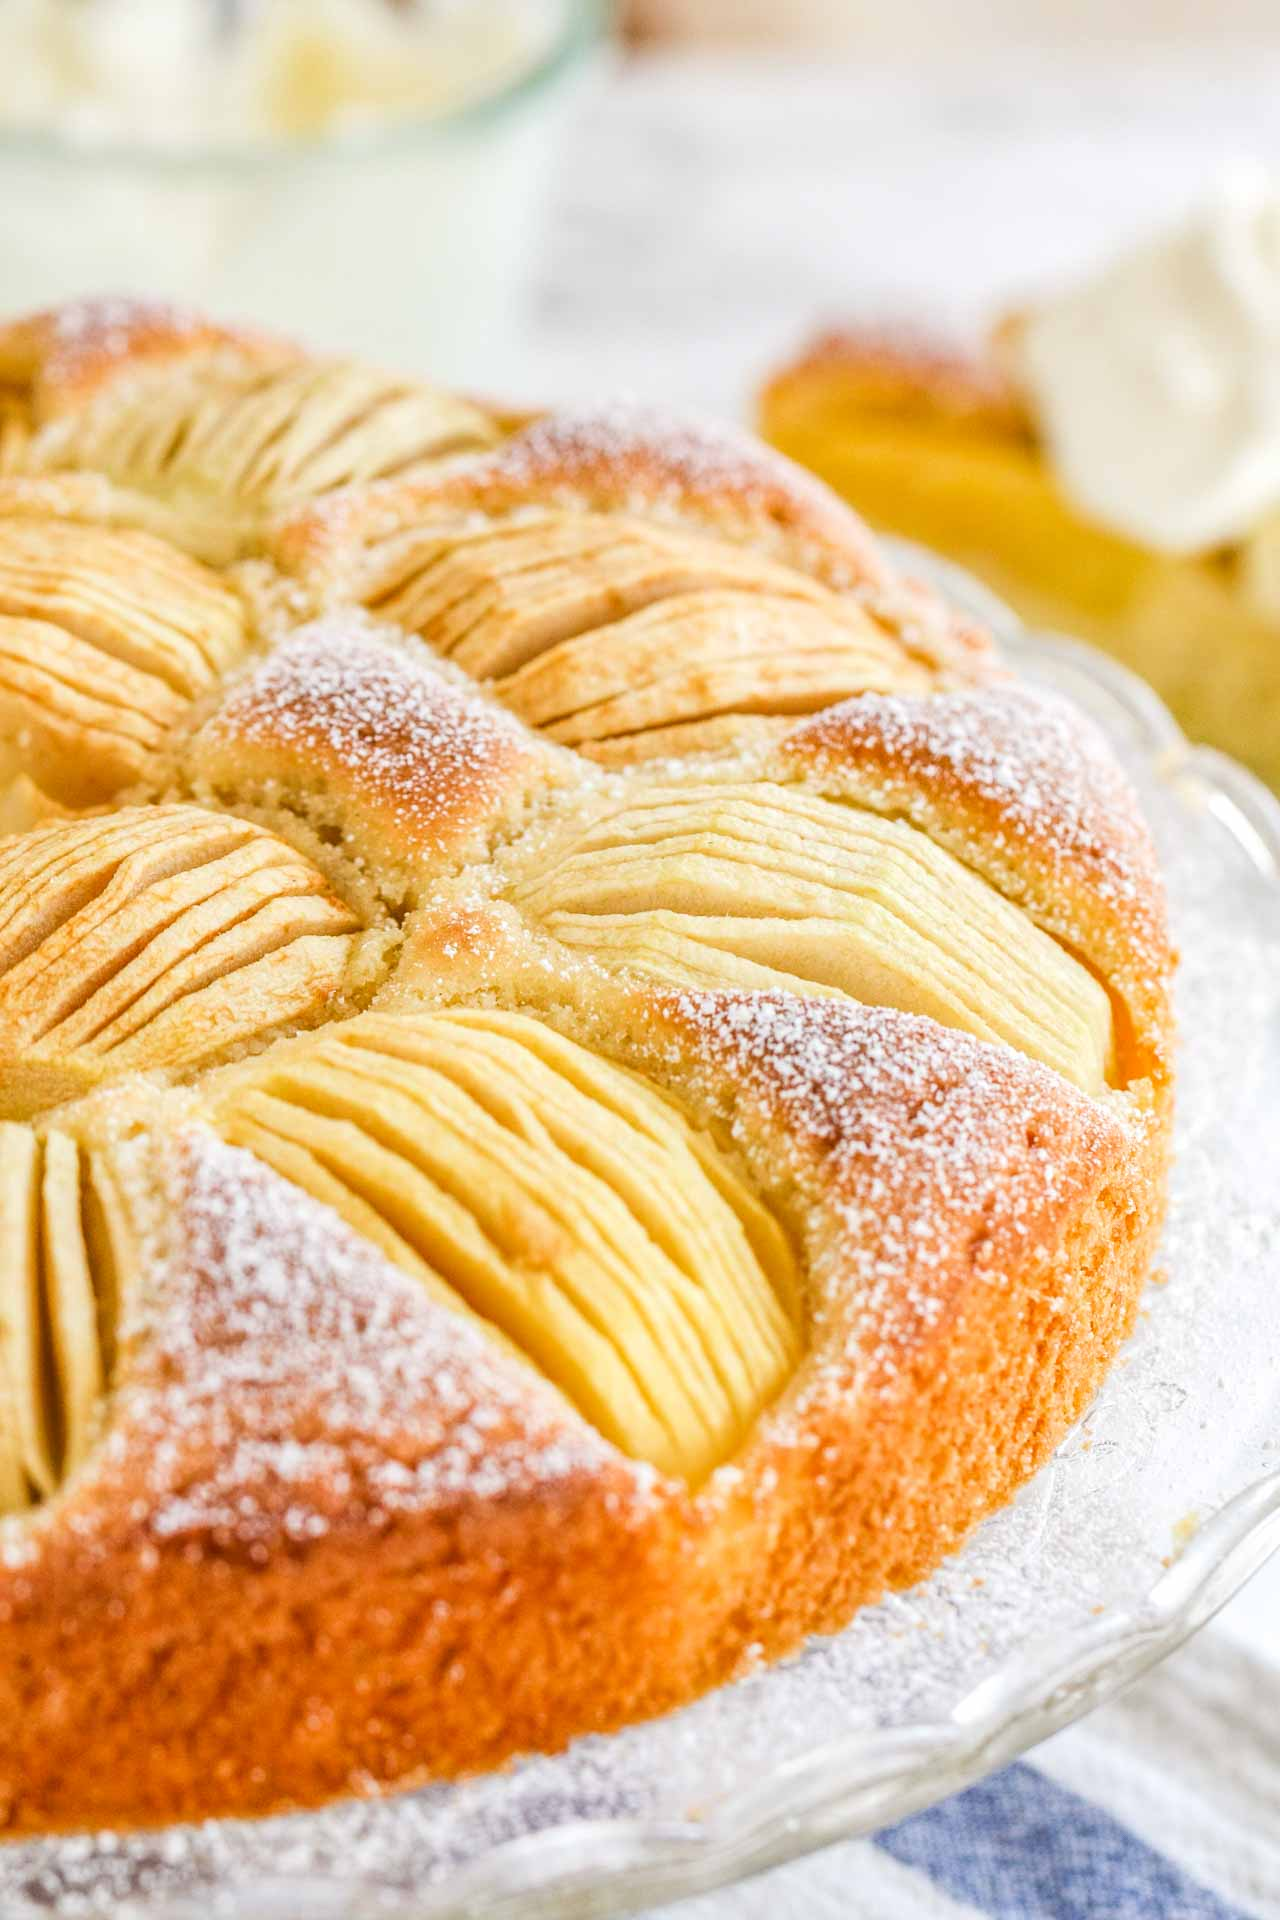 Easy Apple Cake Recipe (Versunkener Apfelkuchen Recipe in English)